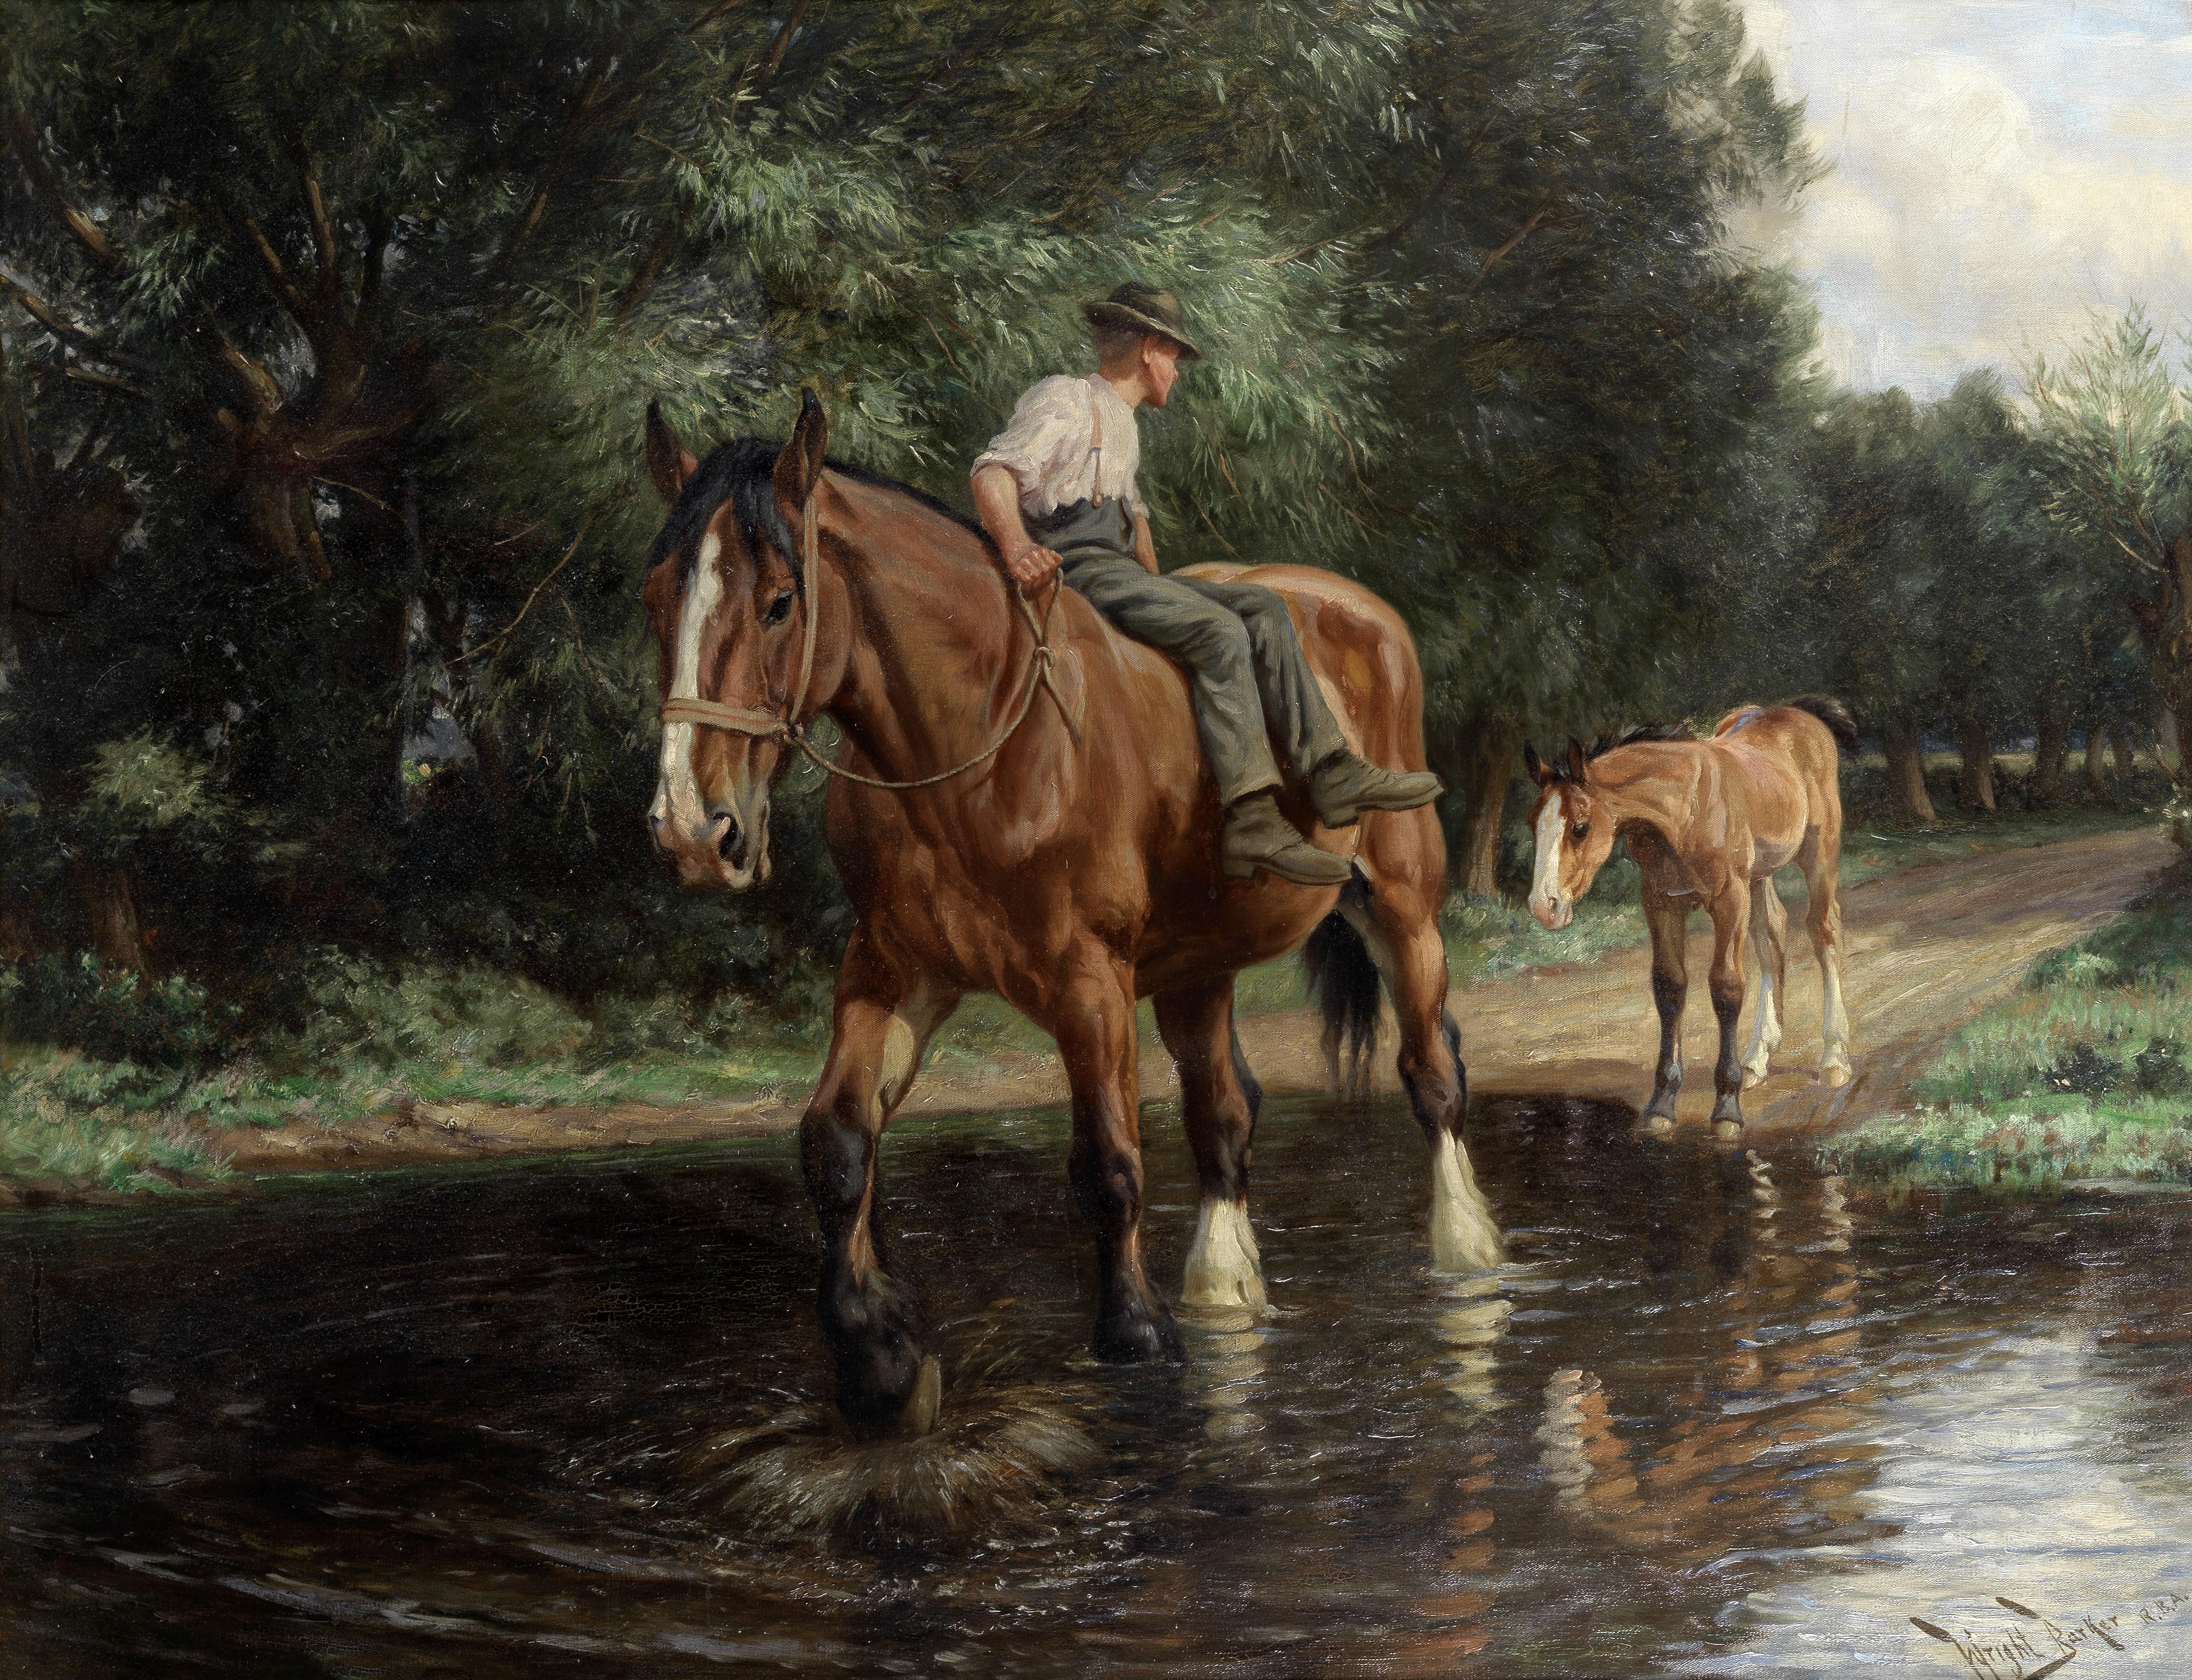 Wright Barker (British, 1863-1941) Hesitation